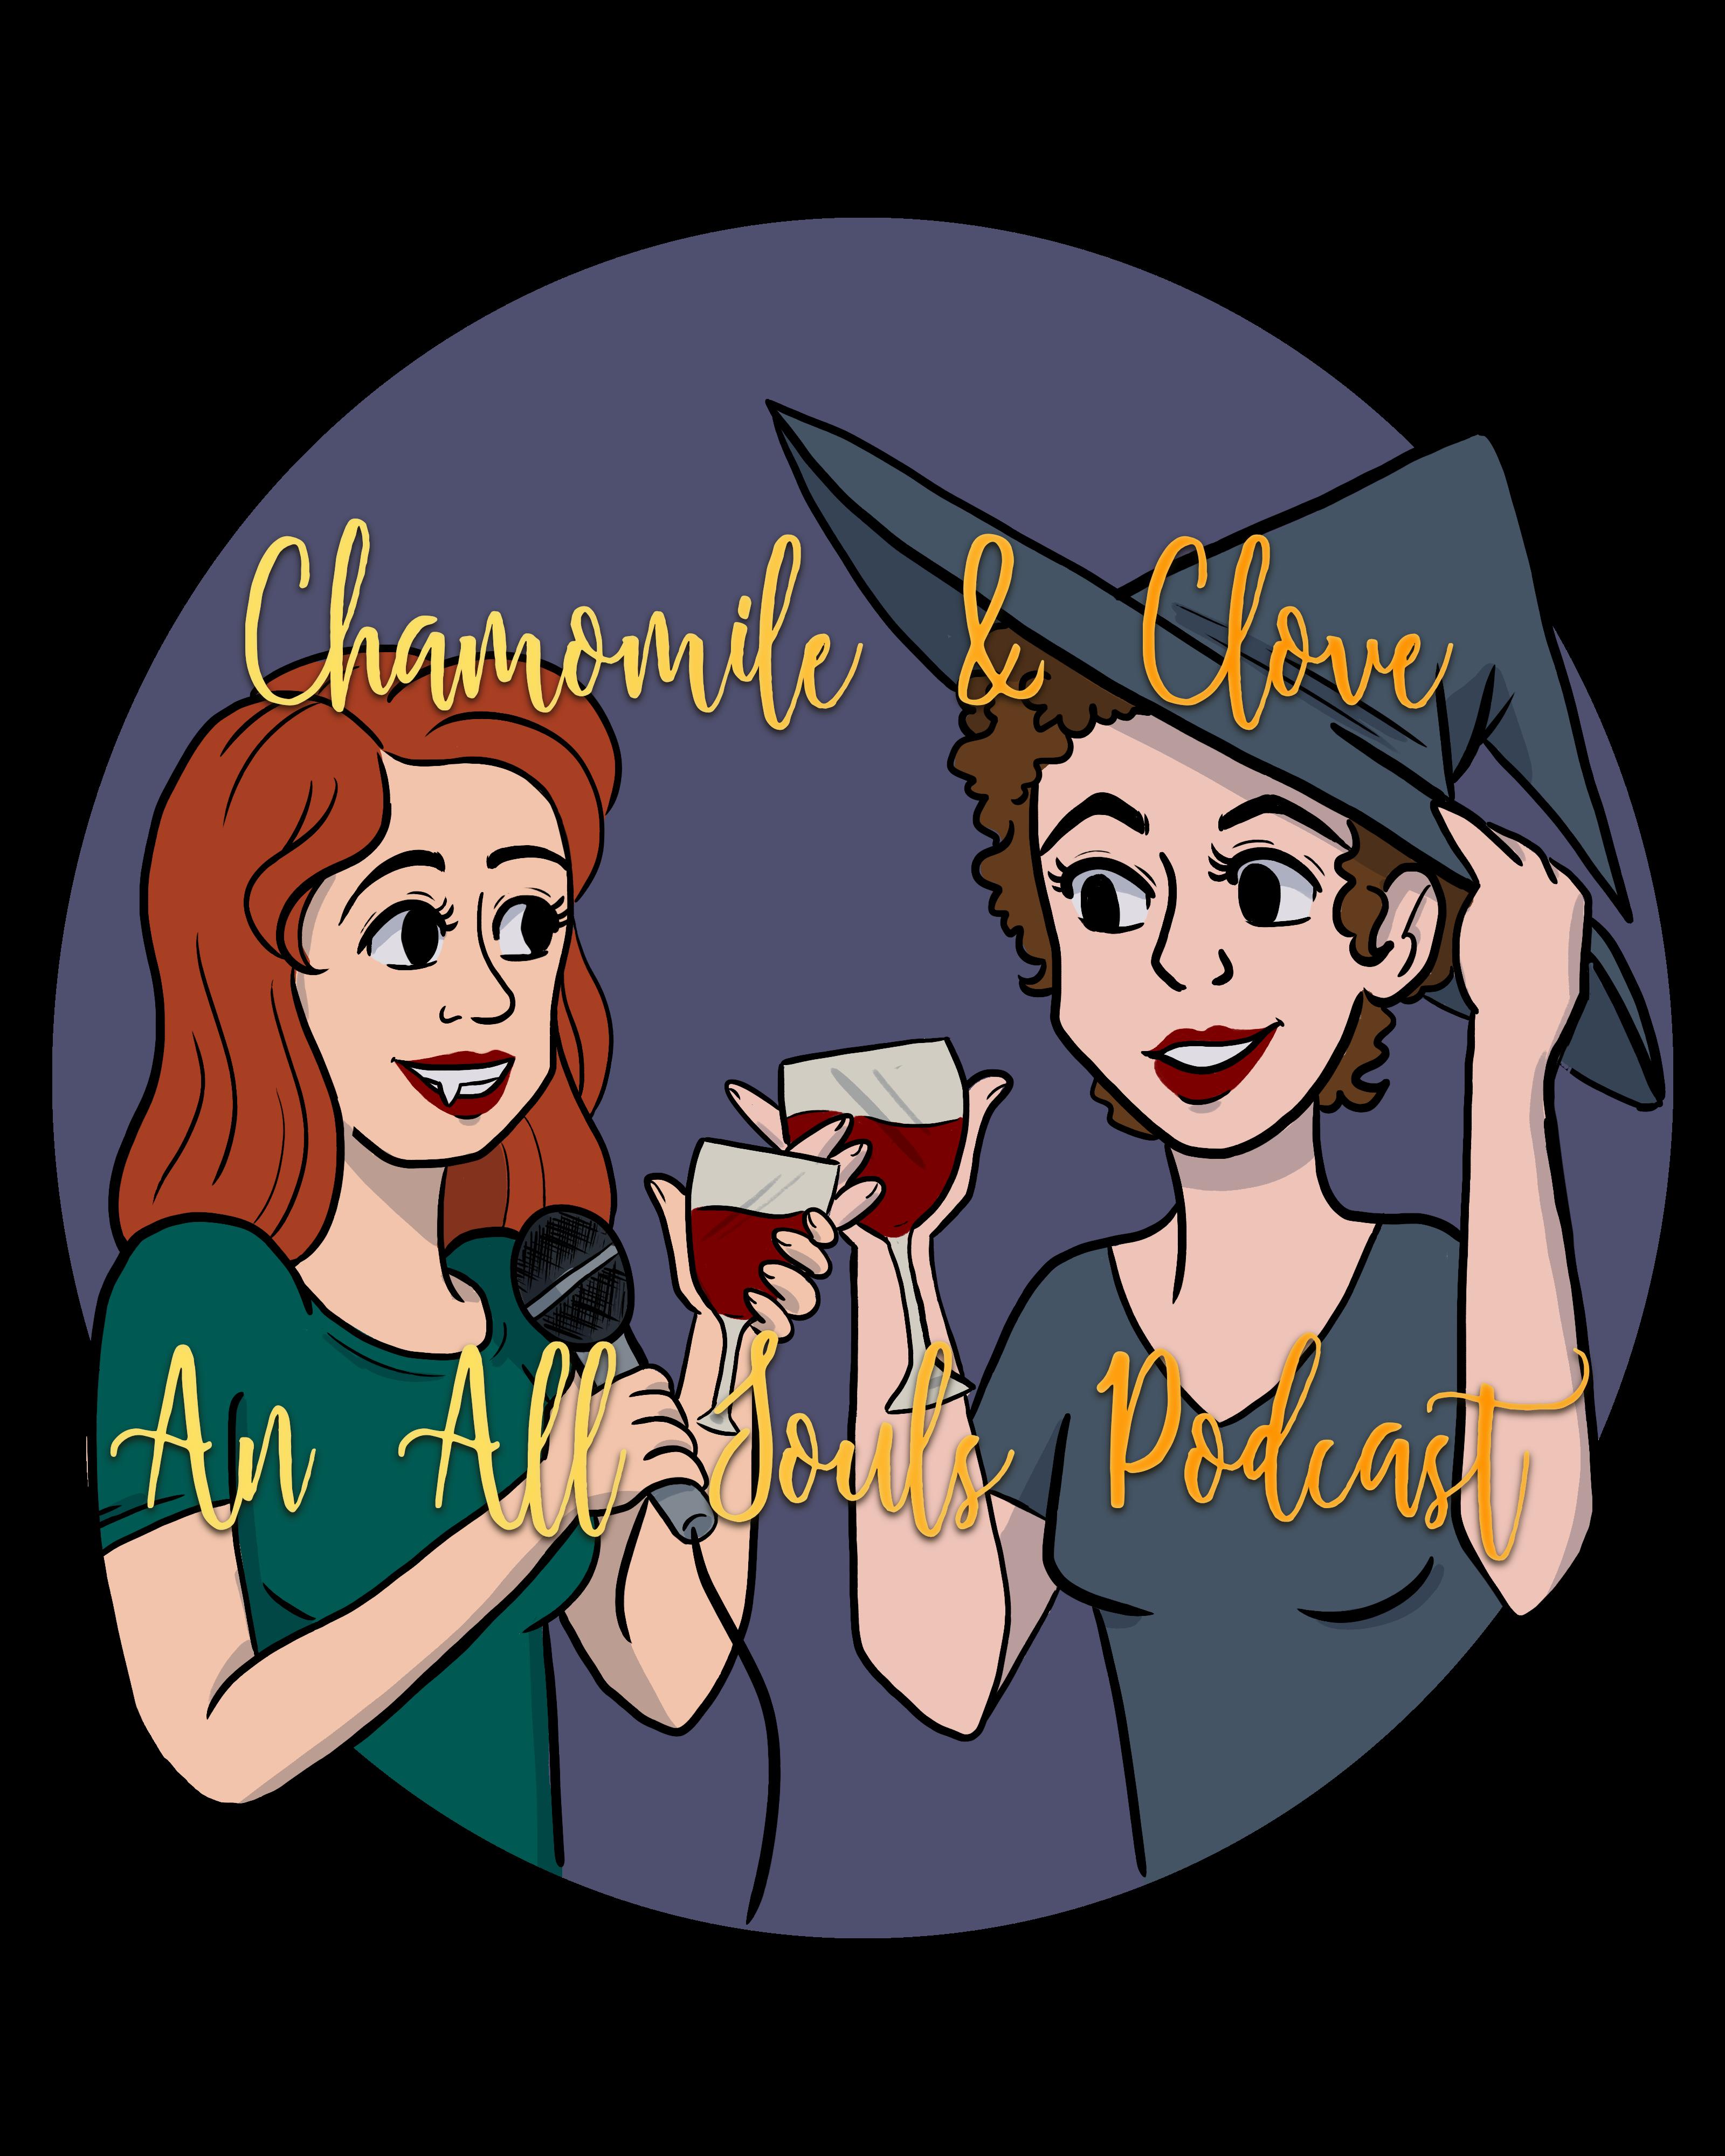 Chamomile & Clove show image